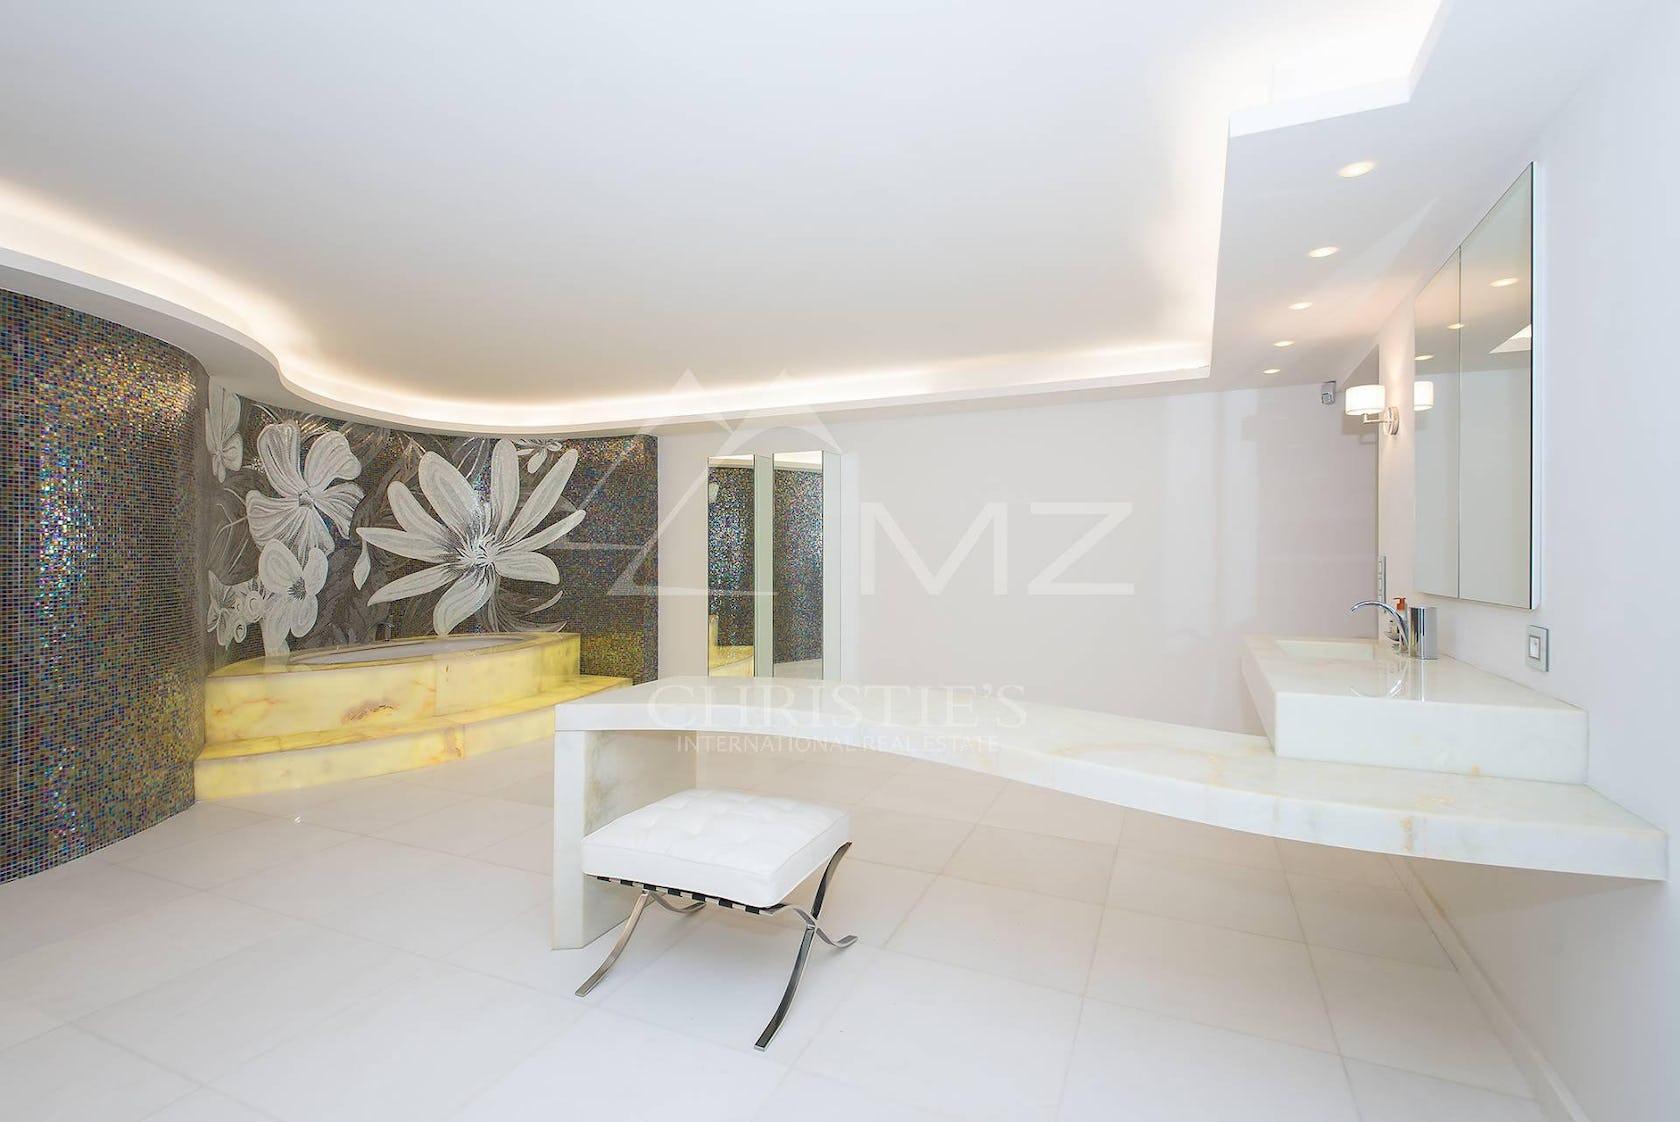 furniture lobby room indoors interior design table flooring floor reception